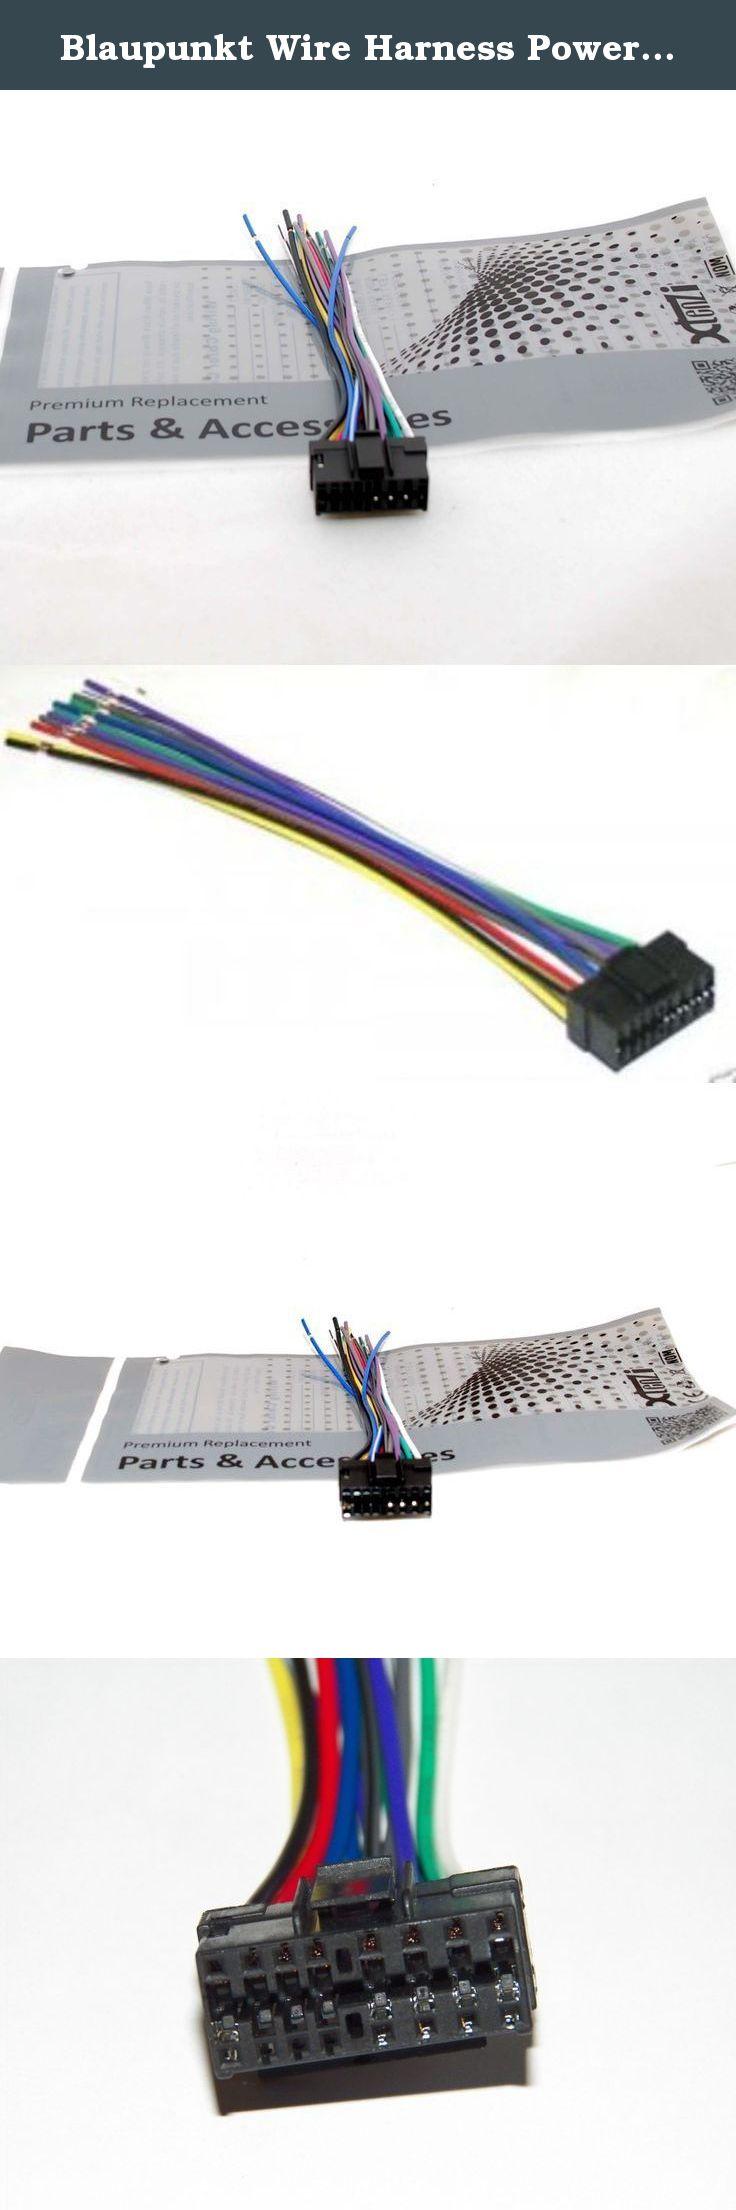 medium resolution of blaupunkt wire harness power plug cd mp3 dvd car stereo head unit 16 pin